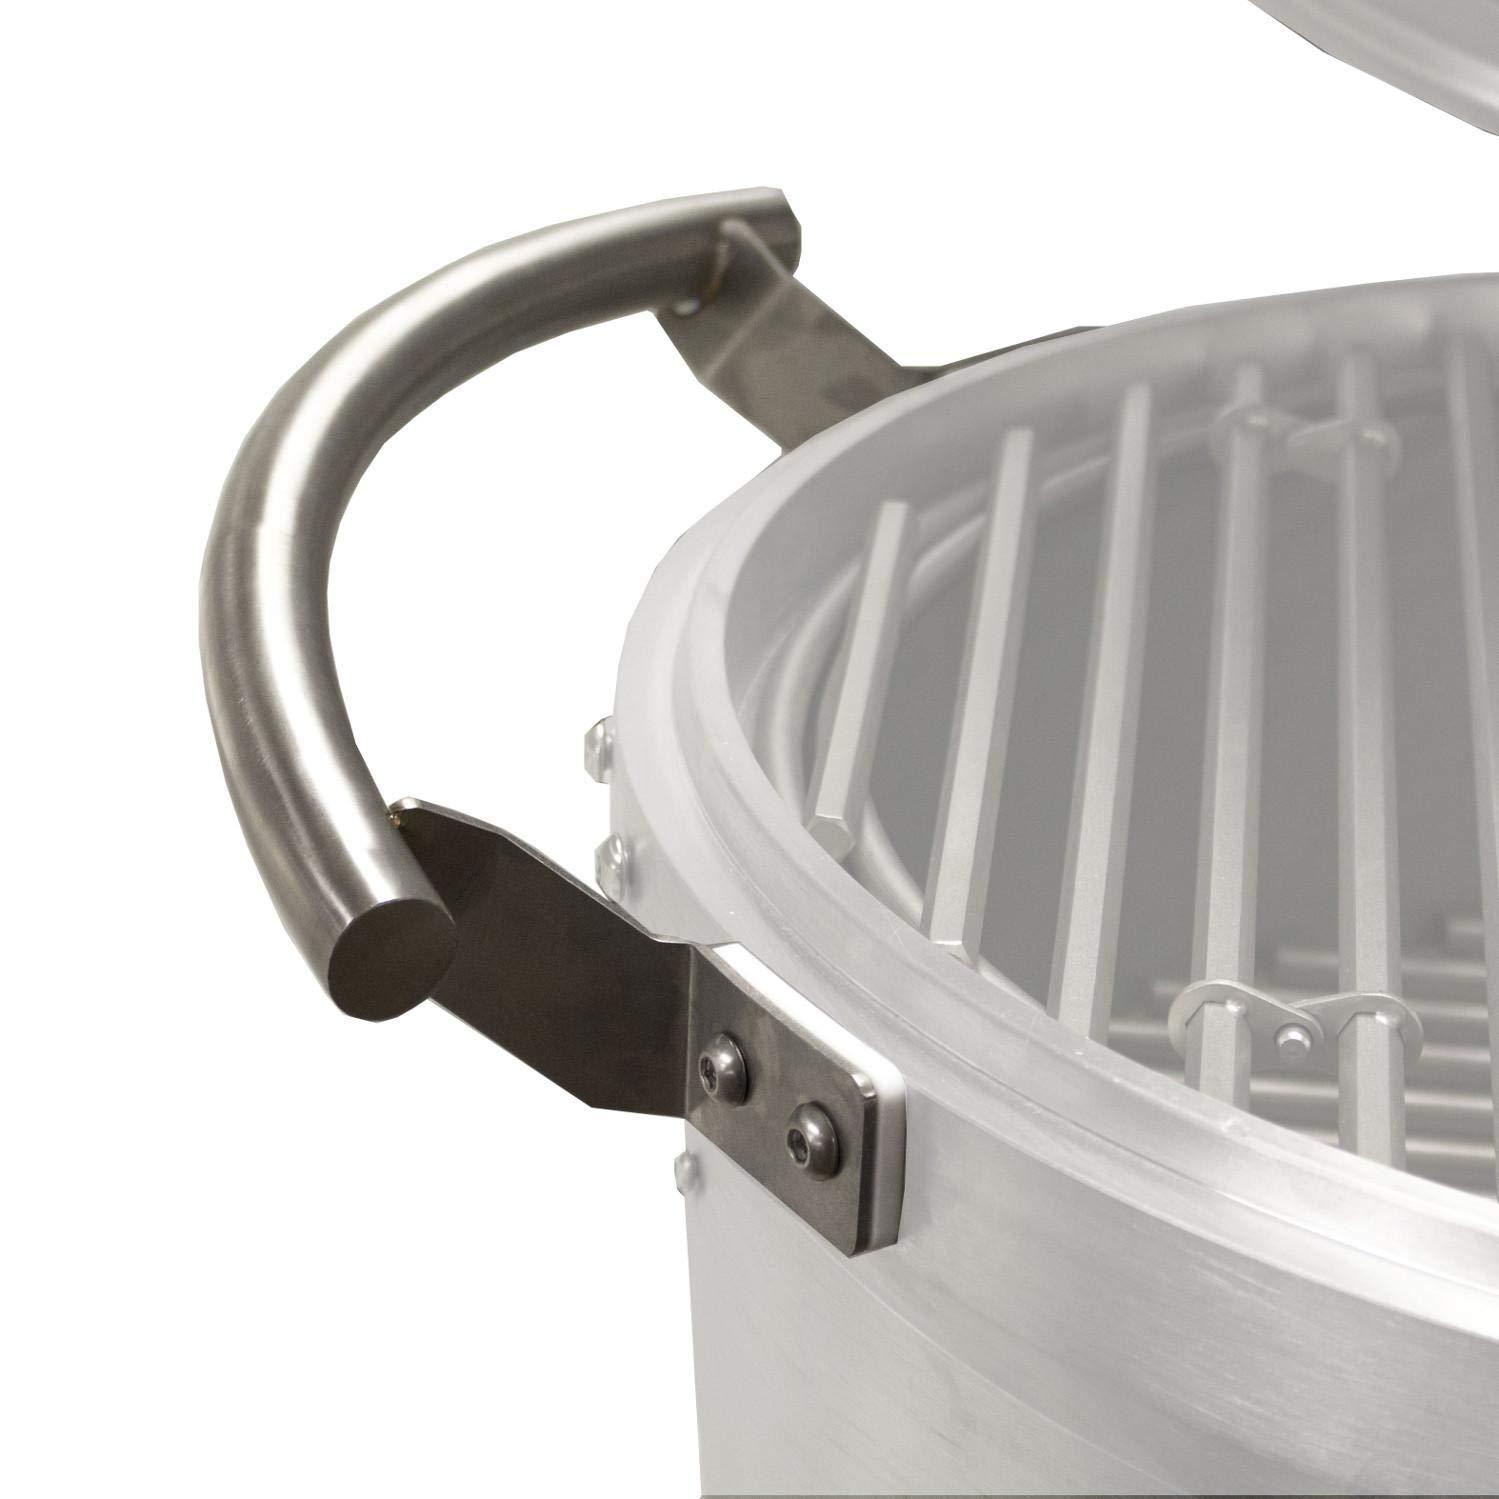 Blaze Stainless Steel Grill Handles for Kamado Grill (BLZ-KMDO-SSHAND) by Blaze